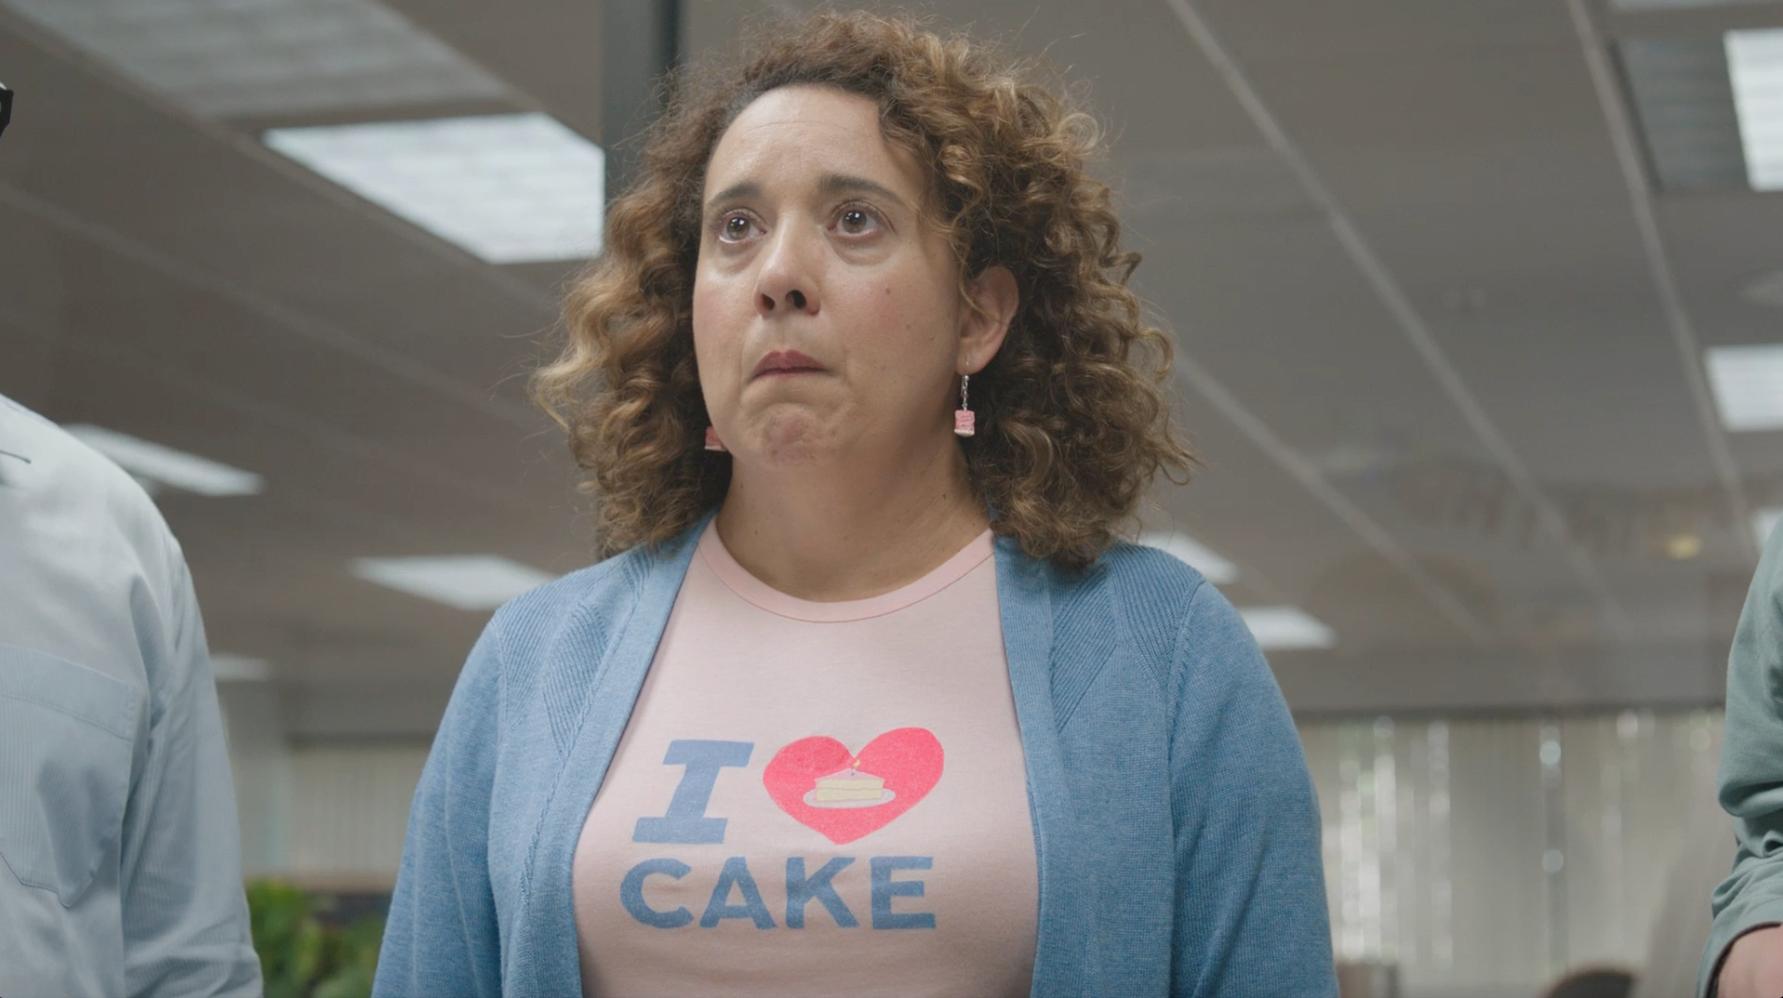 Rite Aid: Who Wants Cake?